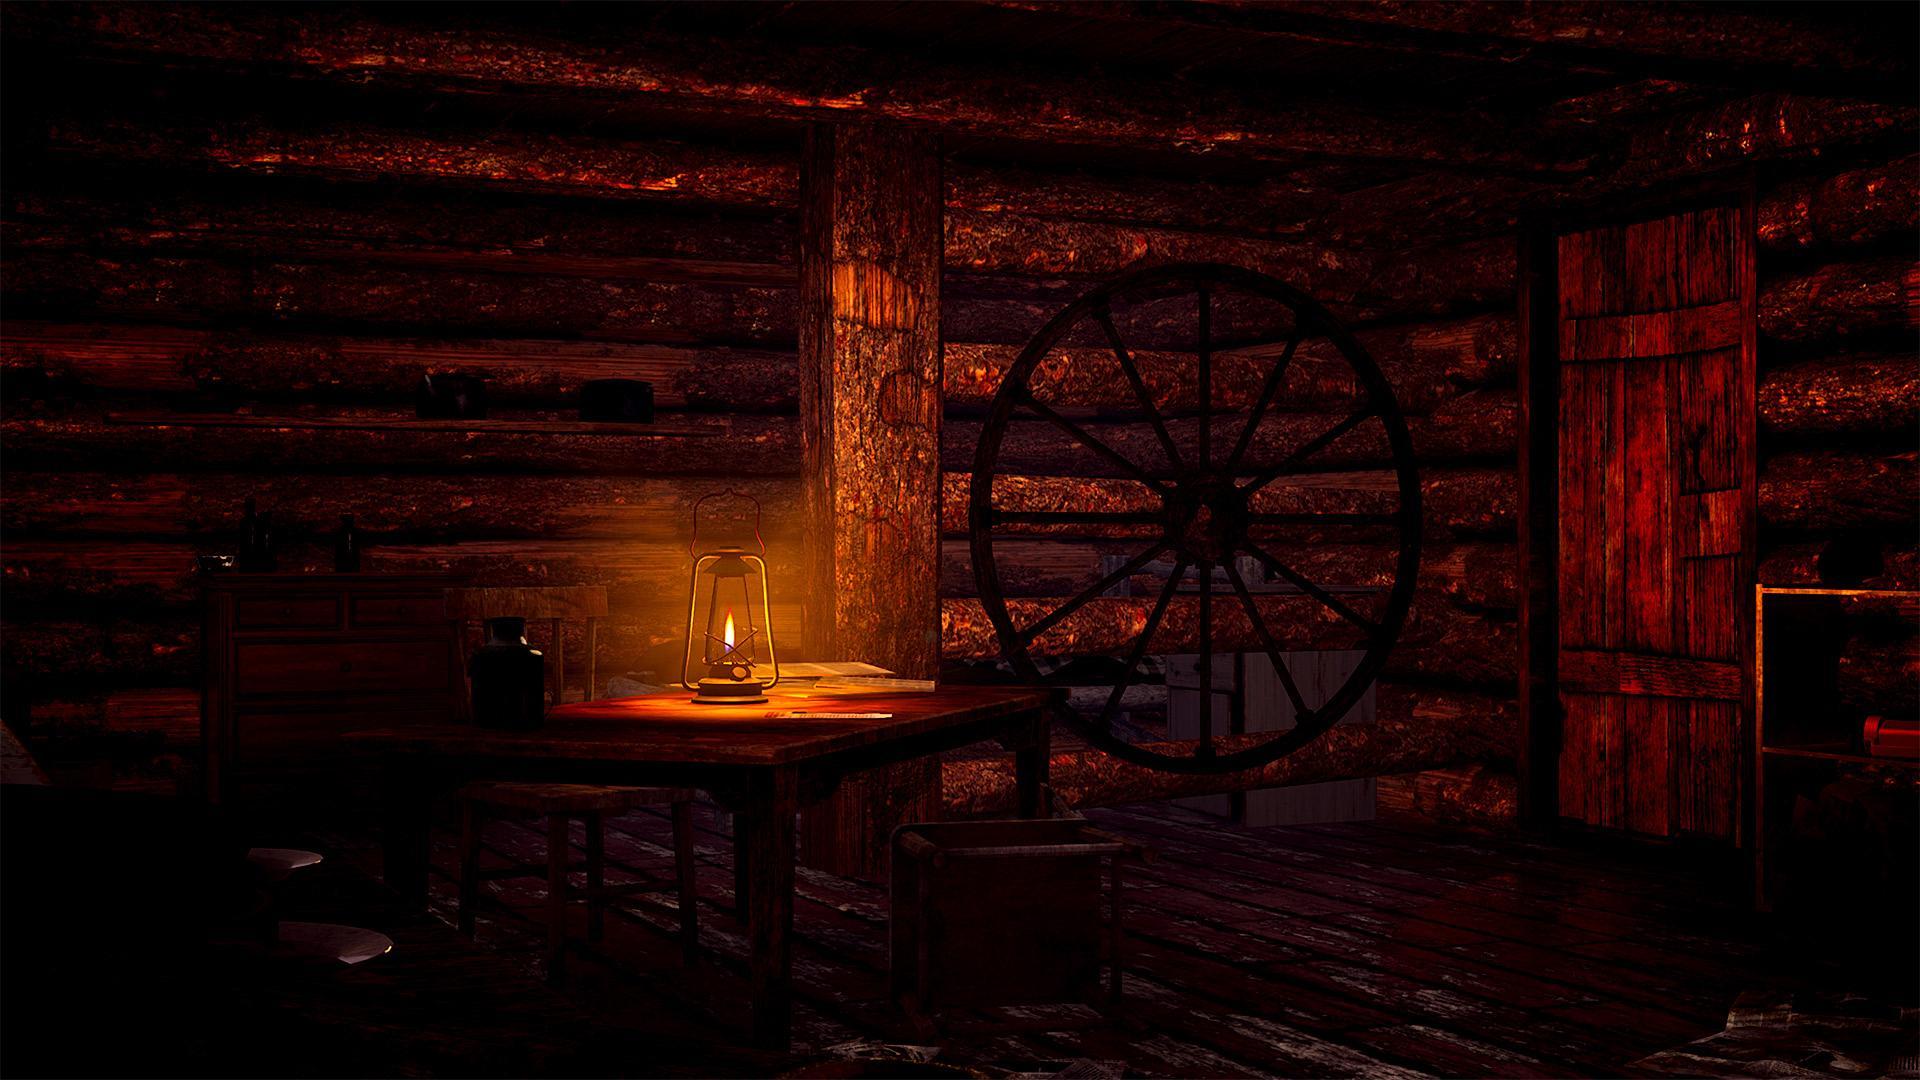 game_screenshot_380